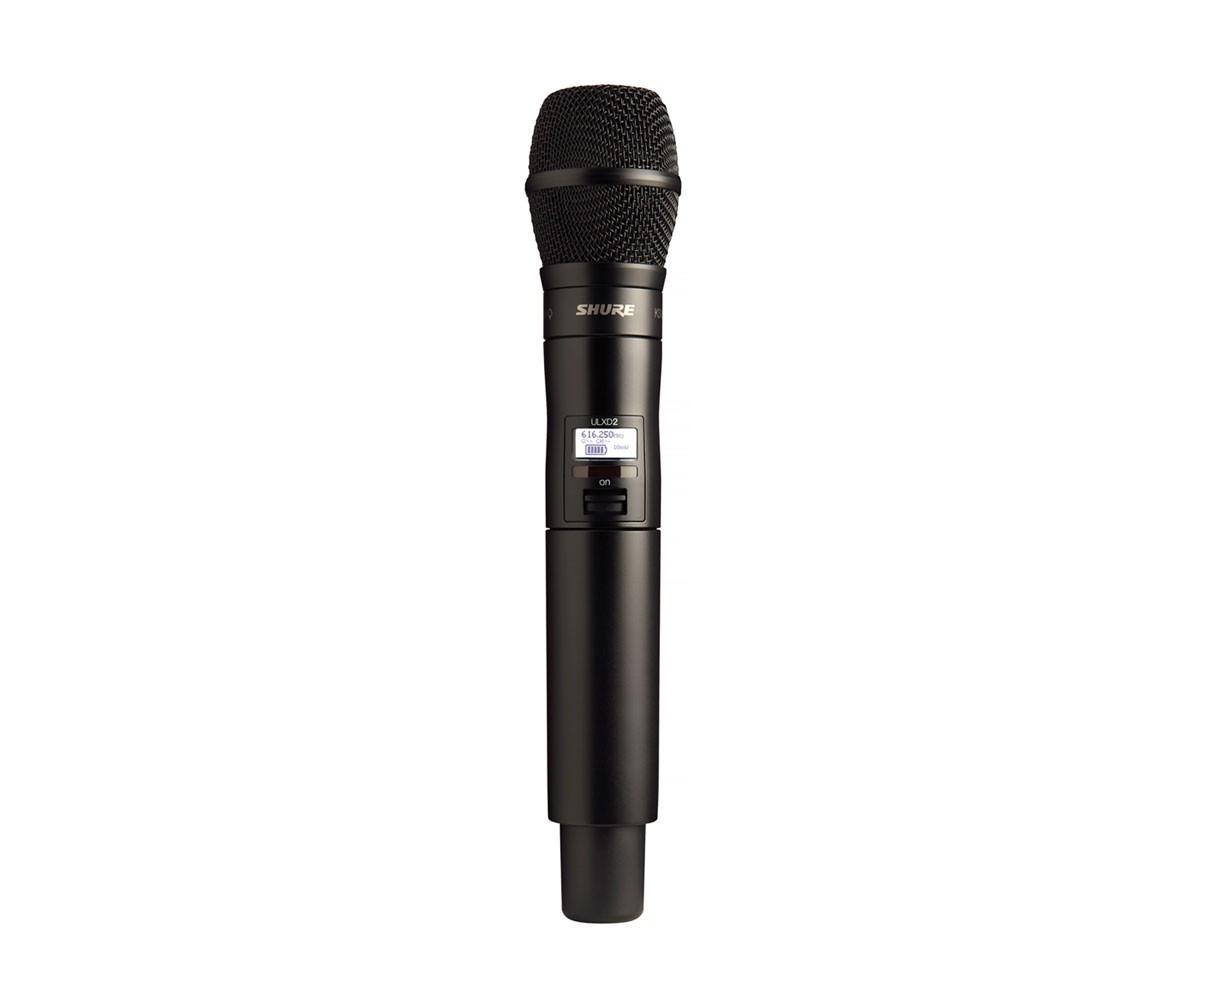 Shure ULXD2/KSM9 (Band G50)